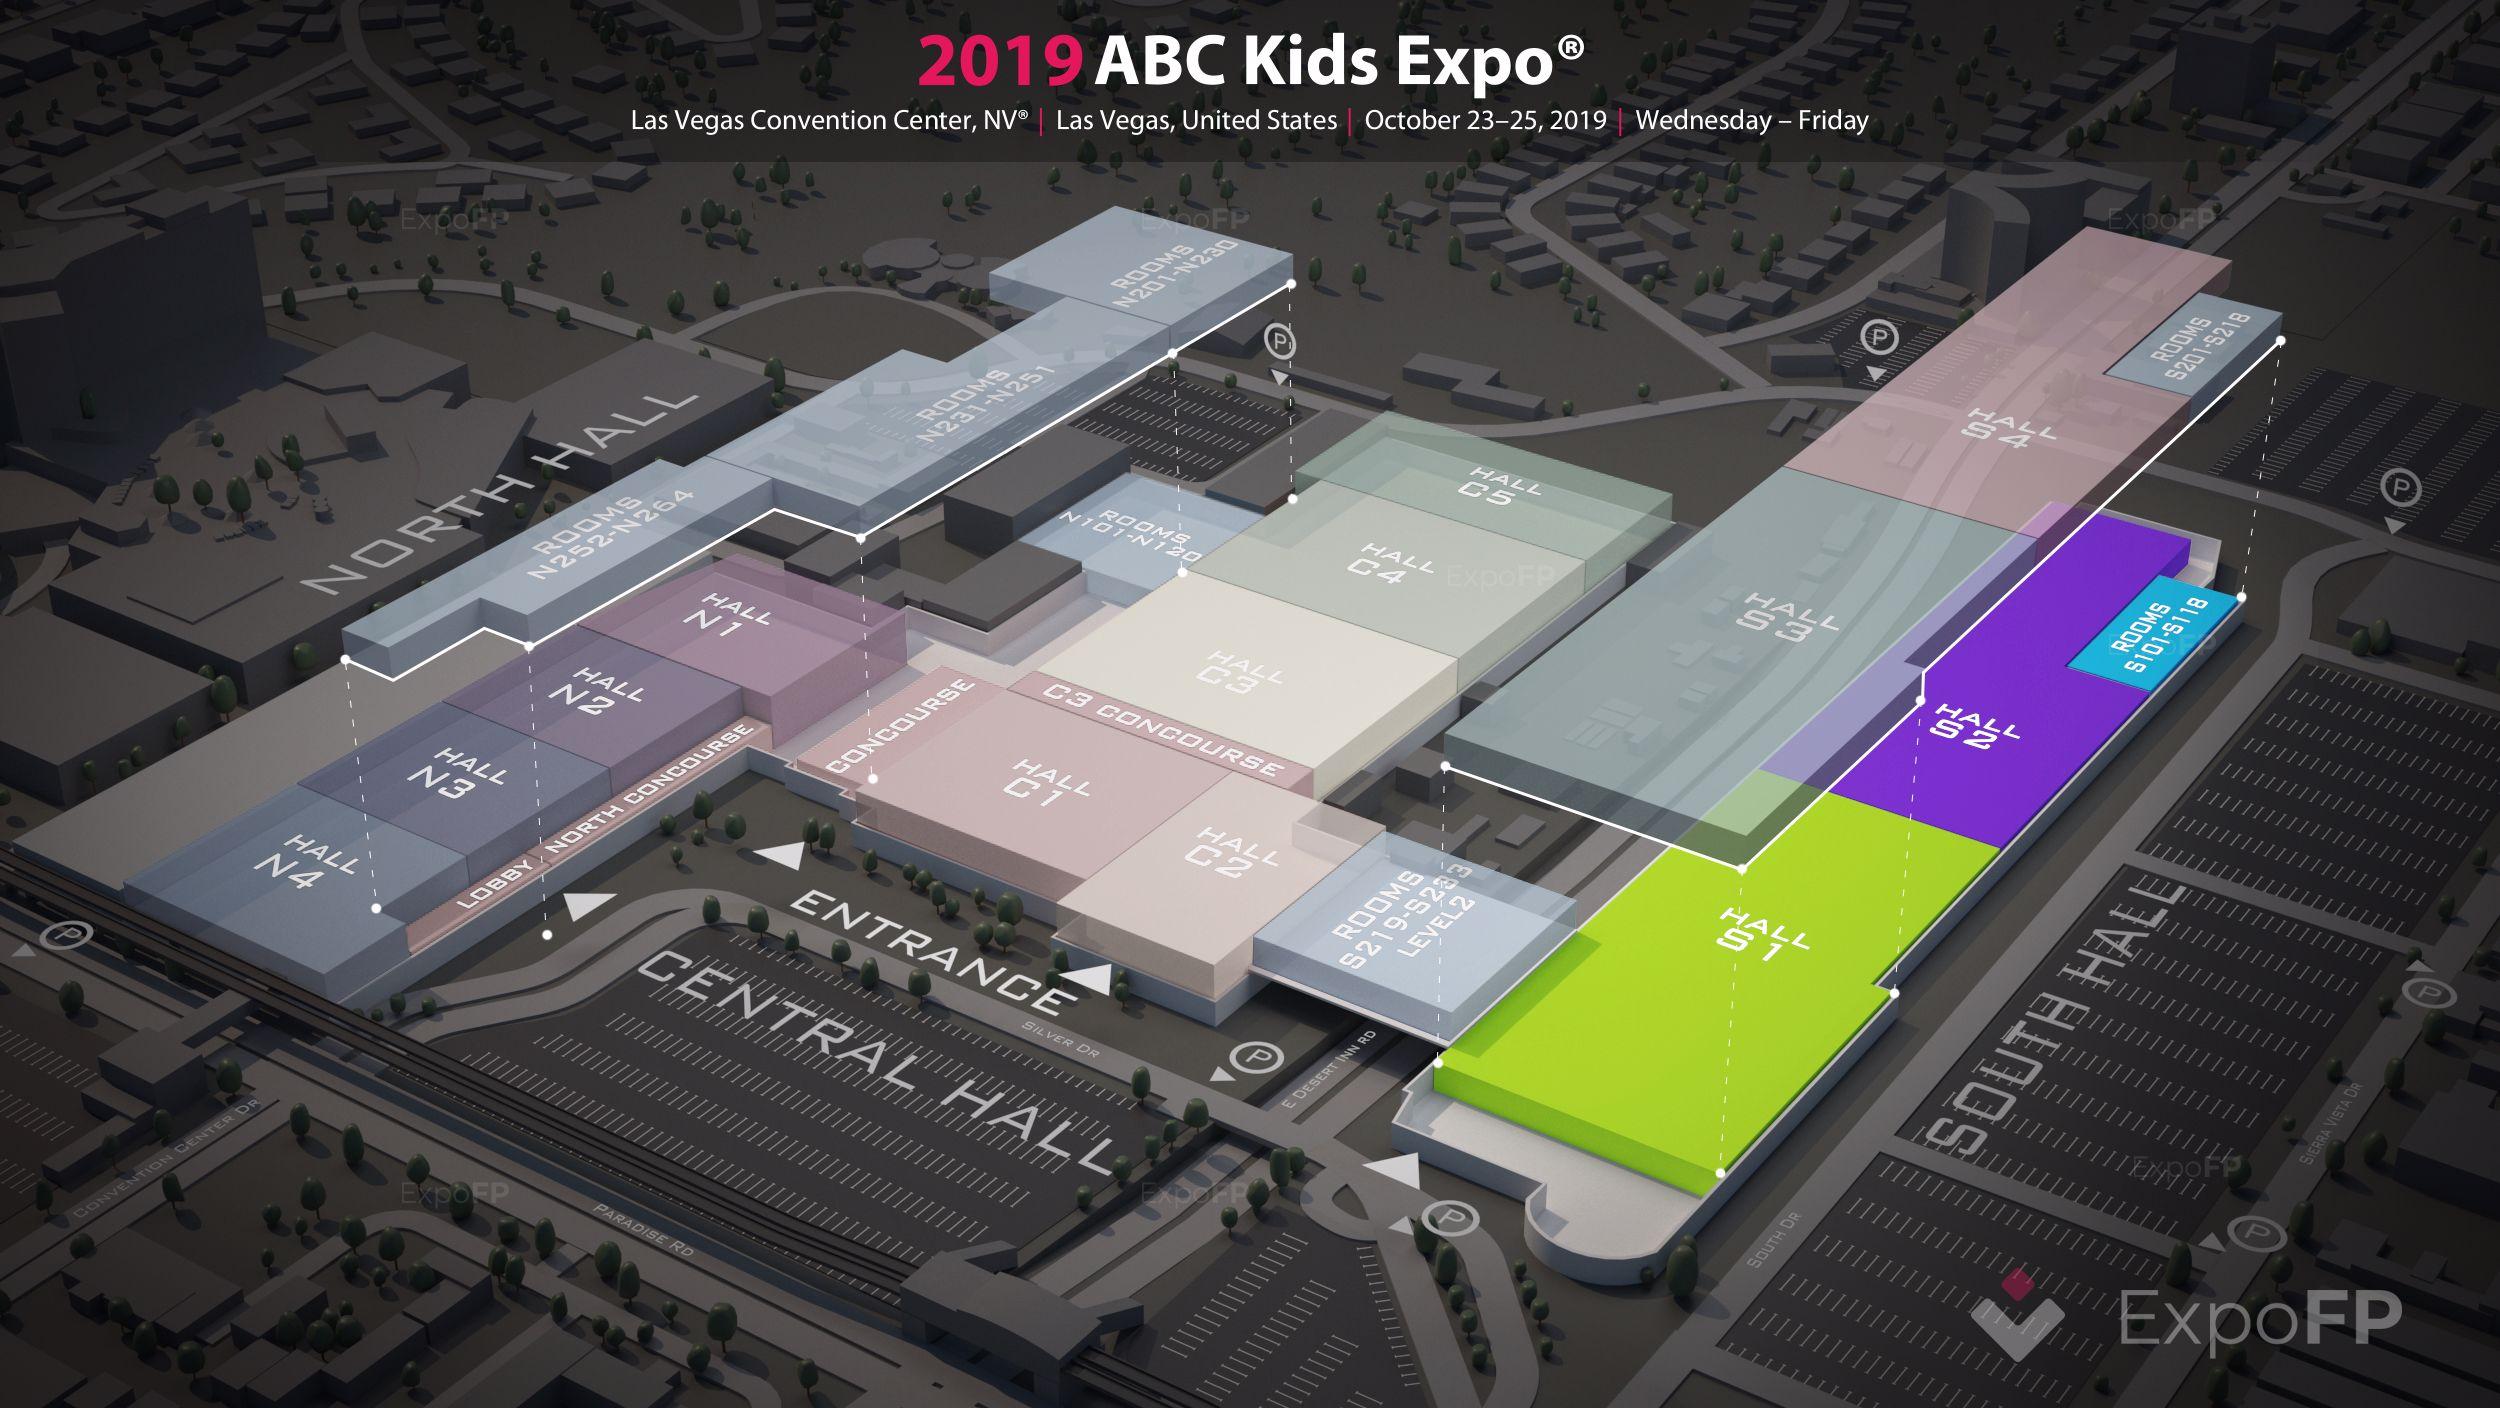 Abc kids expo 2020 las vegas | las vegas convention center floorplan | abc kids expo 2020